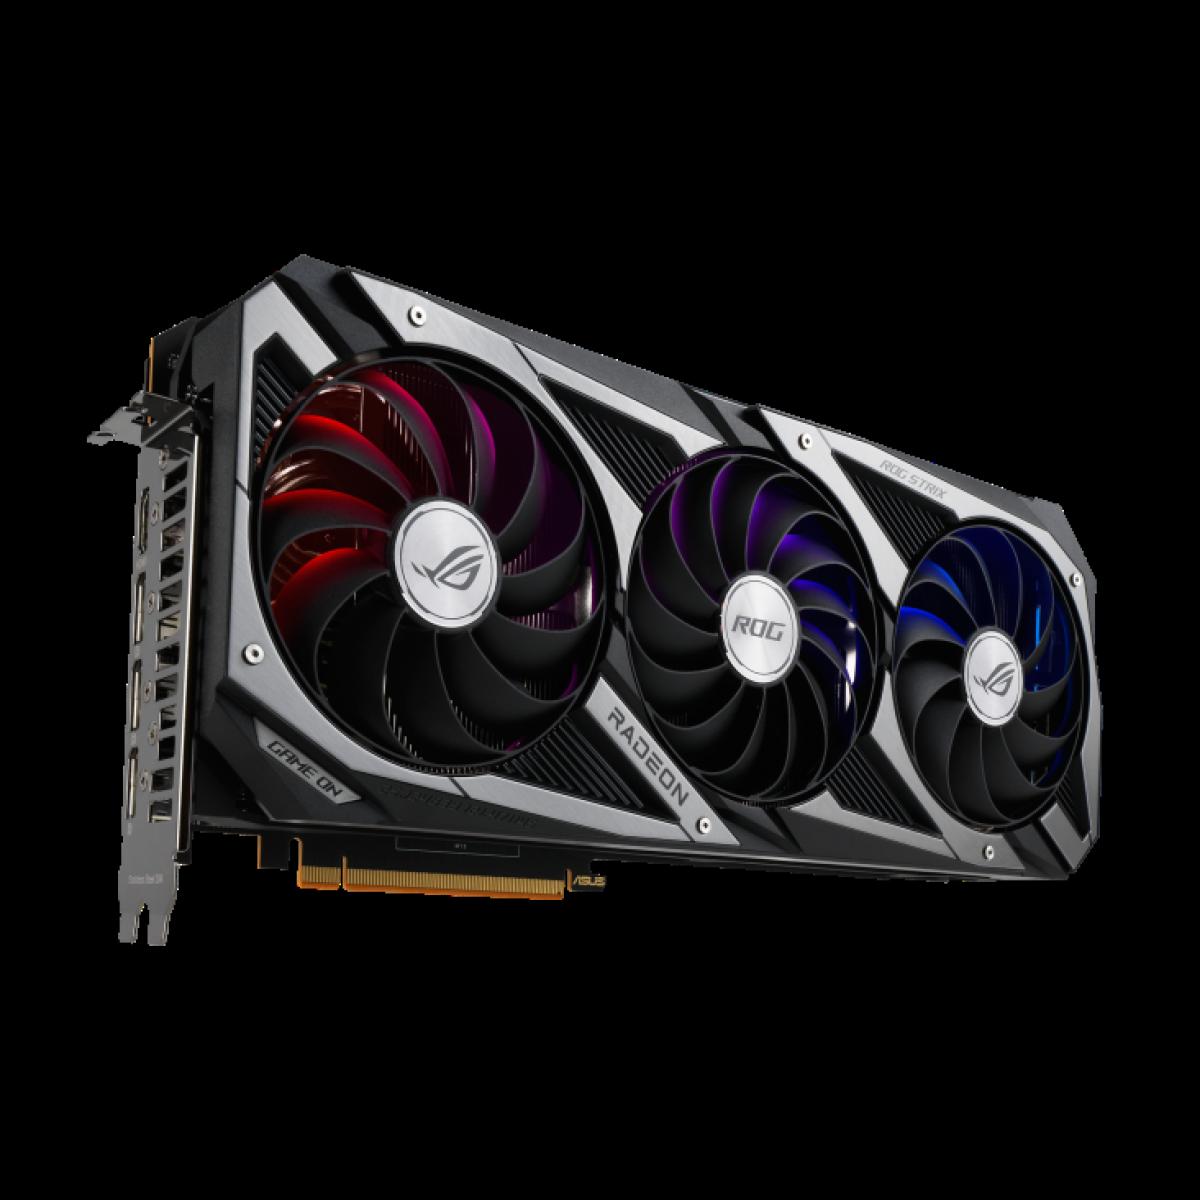 Placa de Vídeo ASUS ROG STRIX Radeon RX 6800, 16GB, GDDR6, 256bit, ROG-STRIX-RX6800-O16G-GAMING